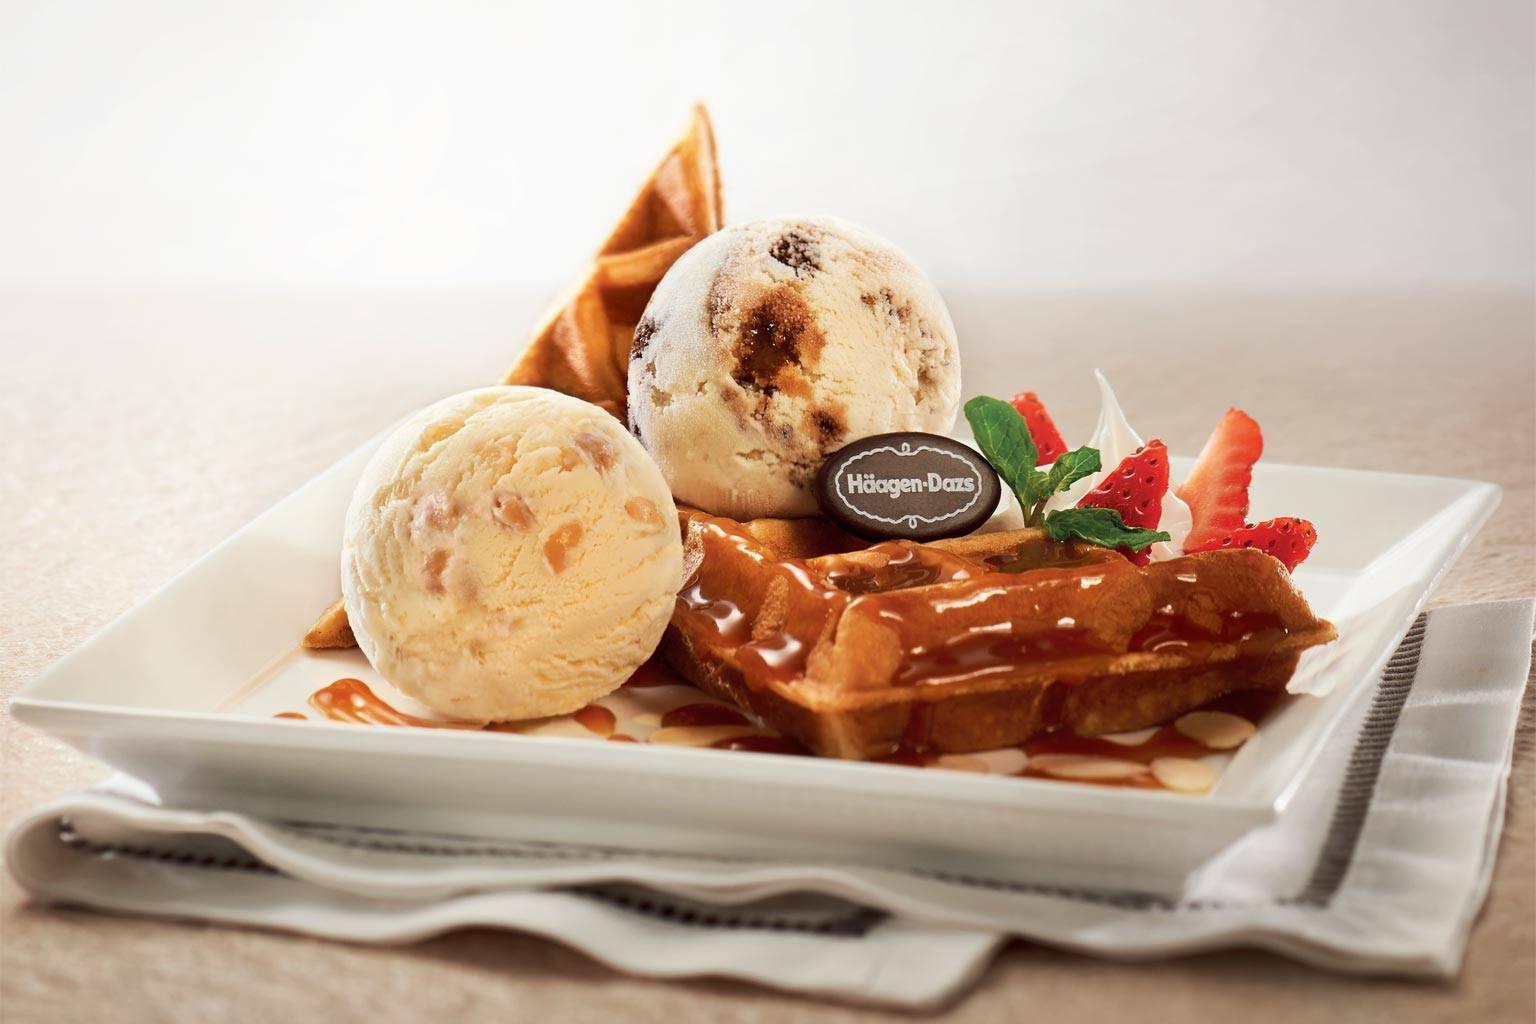 Hagen Daz Waffle Sundae